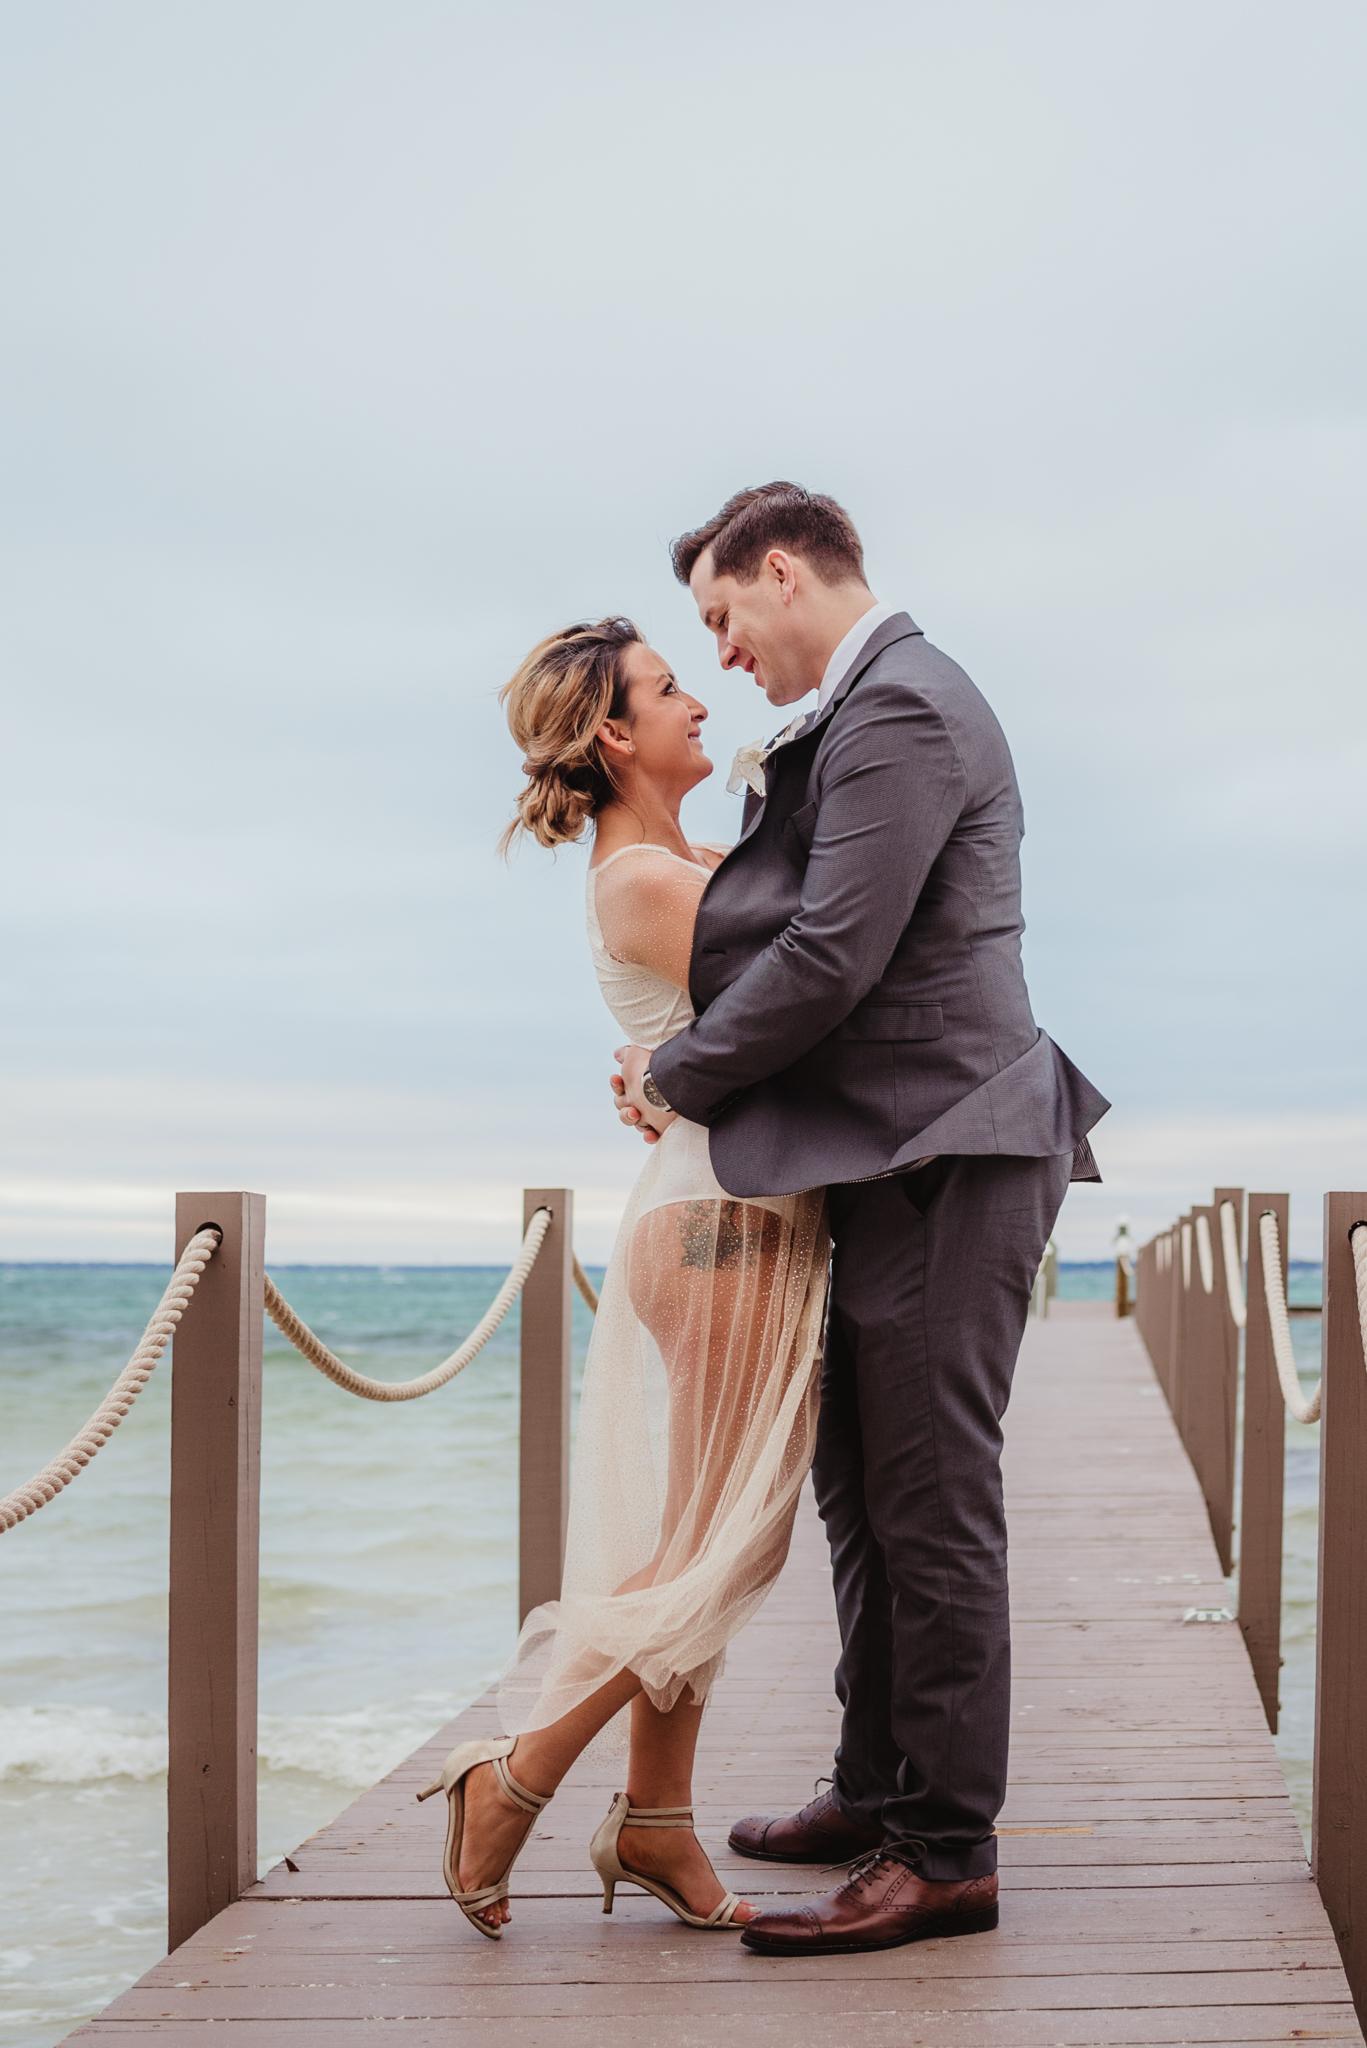 Raleigh-wedding-photography-beach-wedding-portraits-5.jpg